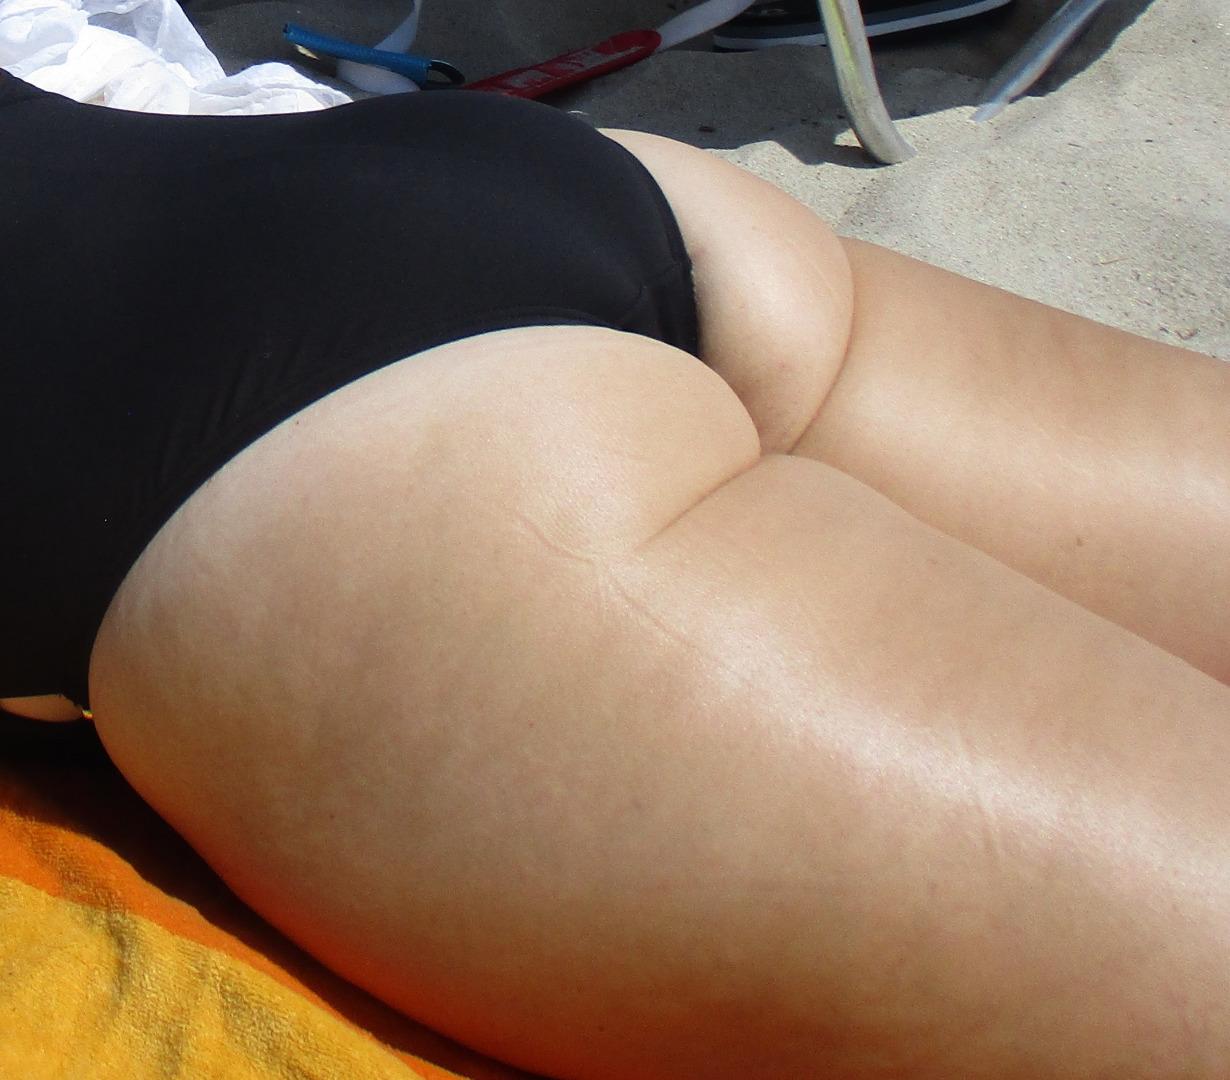 wild hardcore black ultimate surrender shemale #ass#butt#bum#beach#wife#milf#amateur